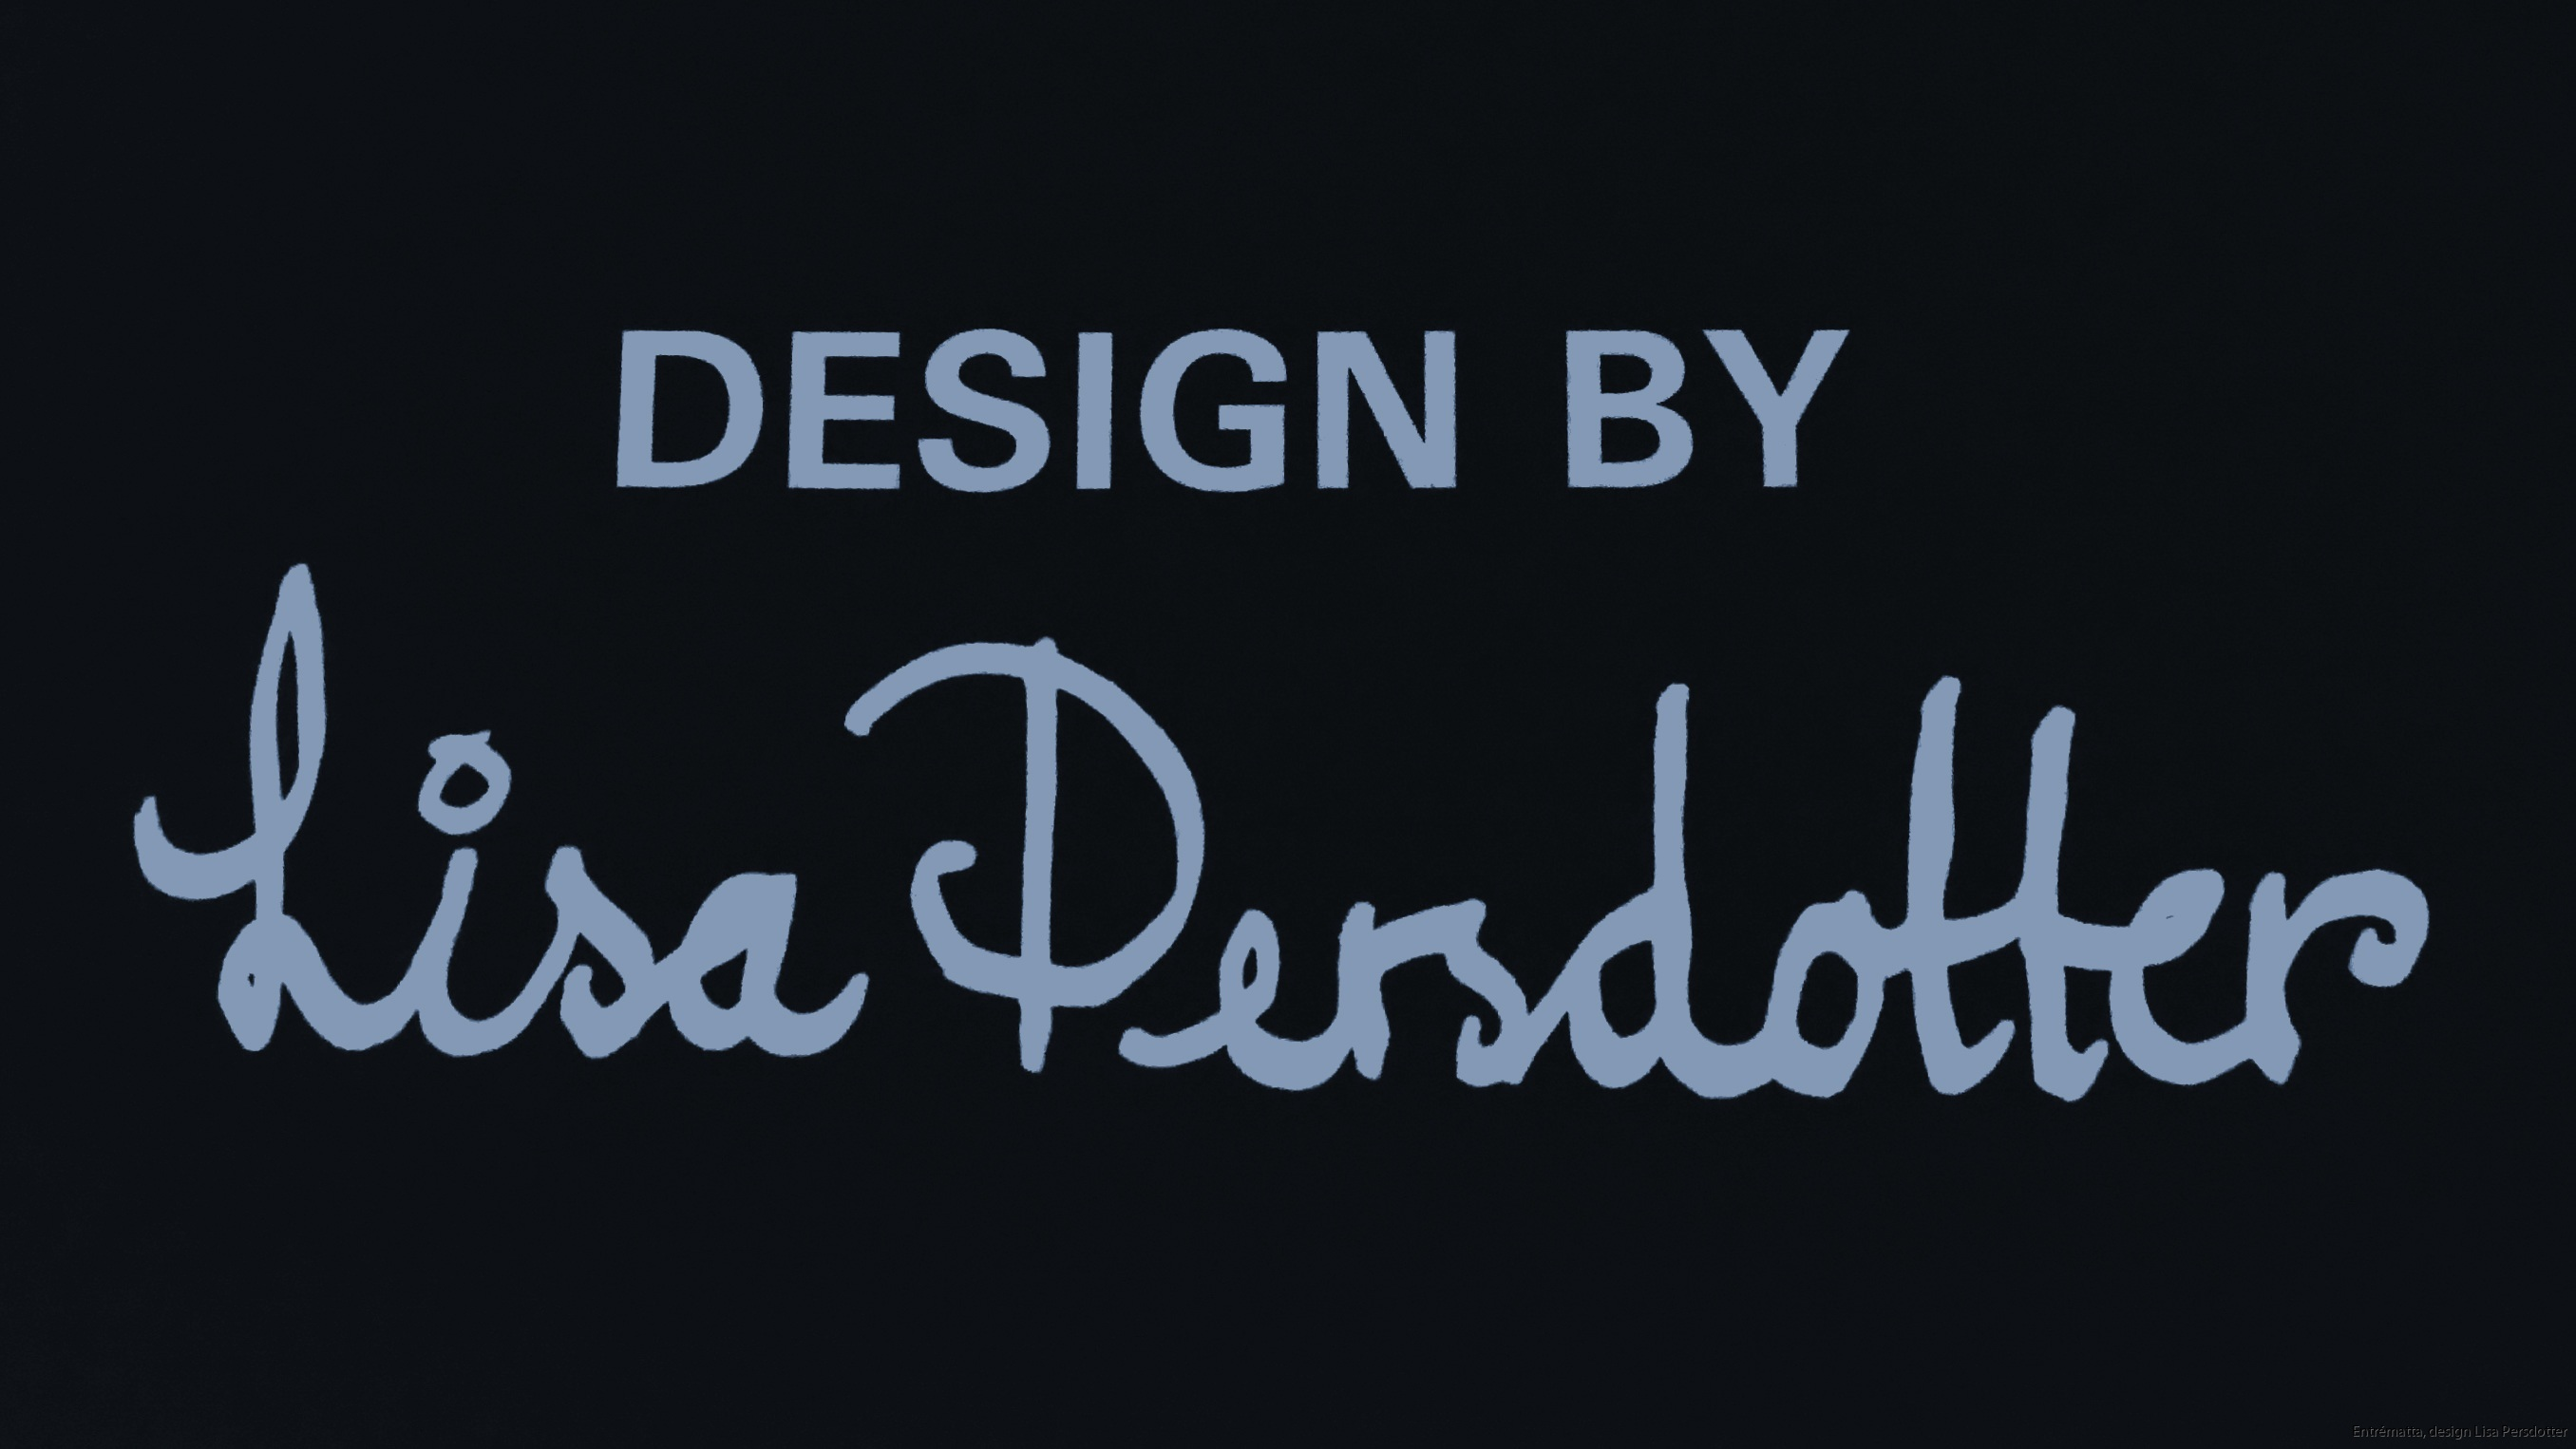 DesignLisa Persdotter